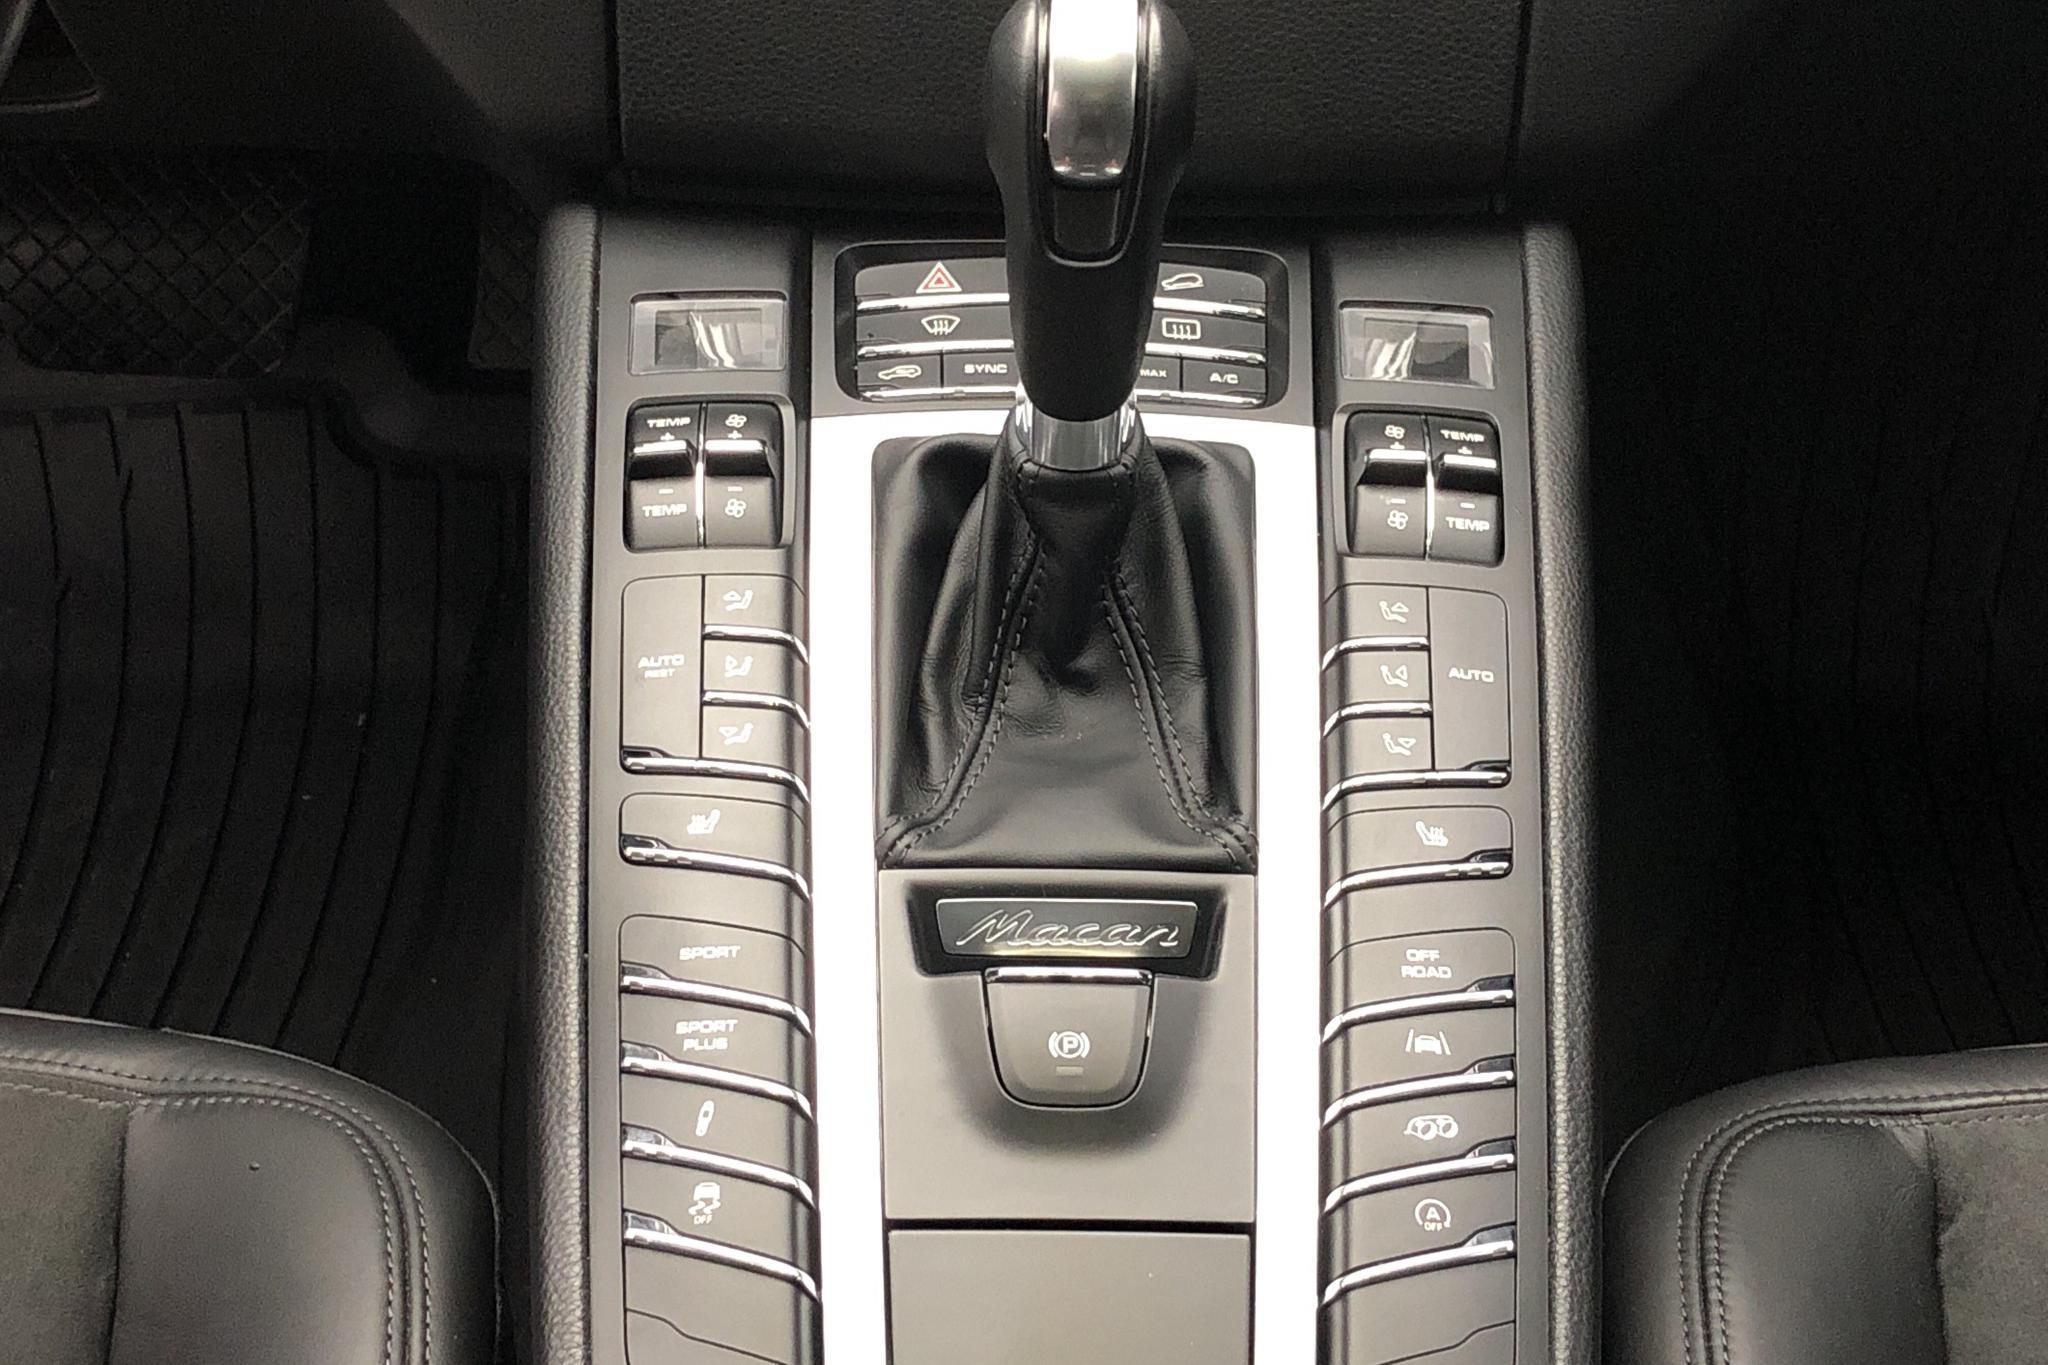 Porsche Macan 3.0 GTS (360hk) - 47 240 km - Automatic - gray - 2018